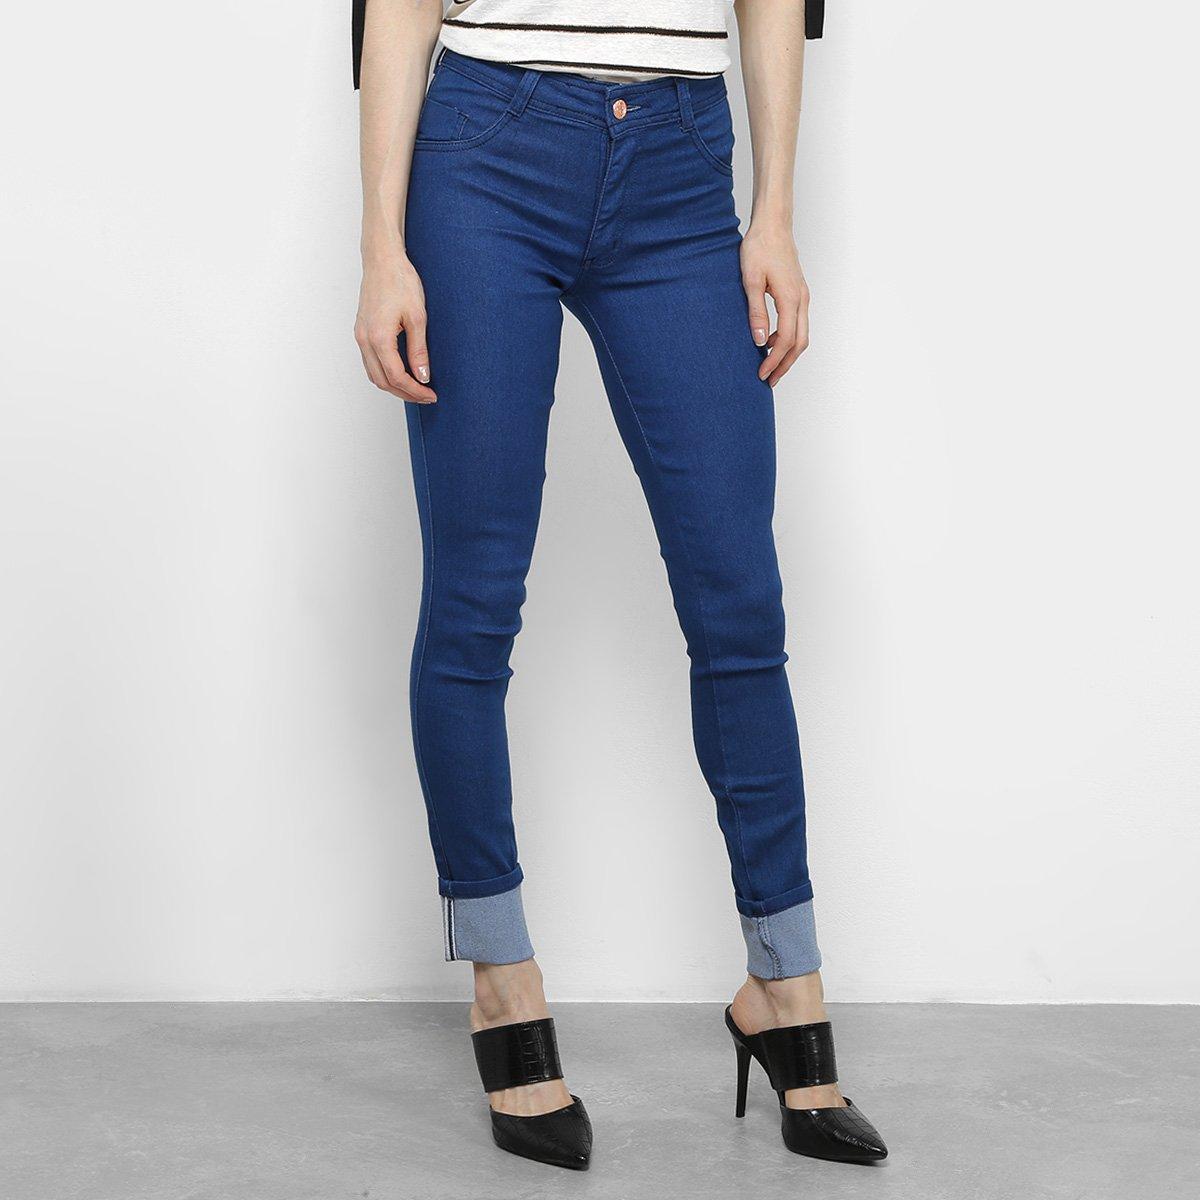 eea9f3bfe Calça Jeans Skinny Biotipo Barra Dobrada Feminina | Zattini